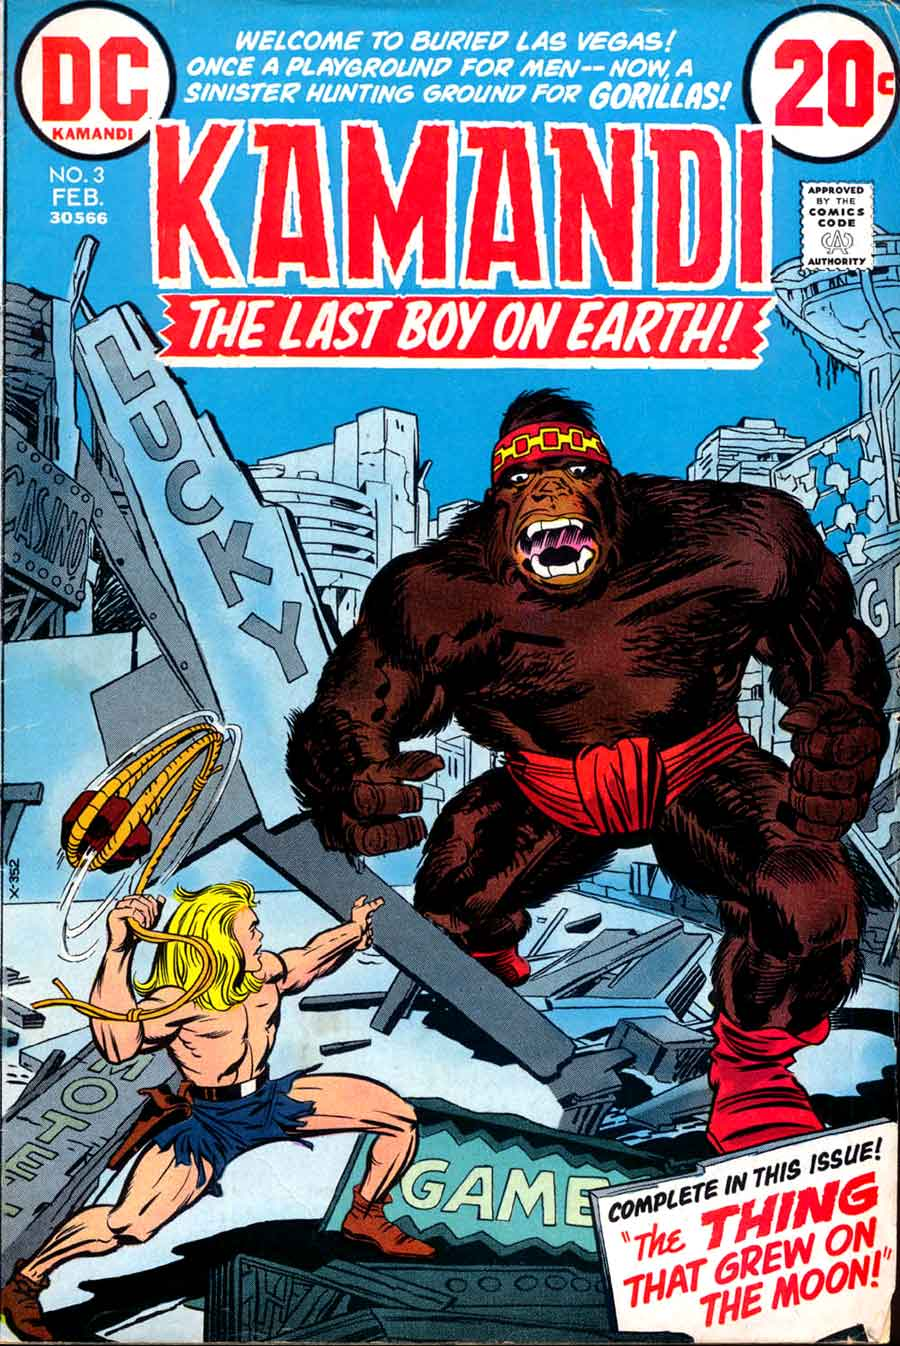 Kamandi v1 #3 dc 1970s bronze age comic book cover art by Jack Kirby